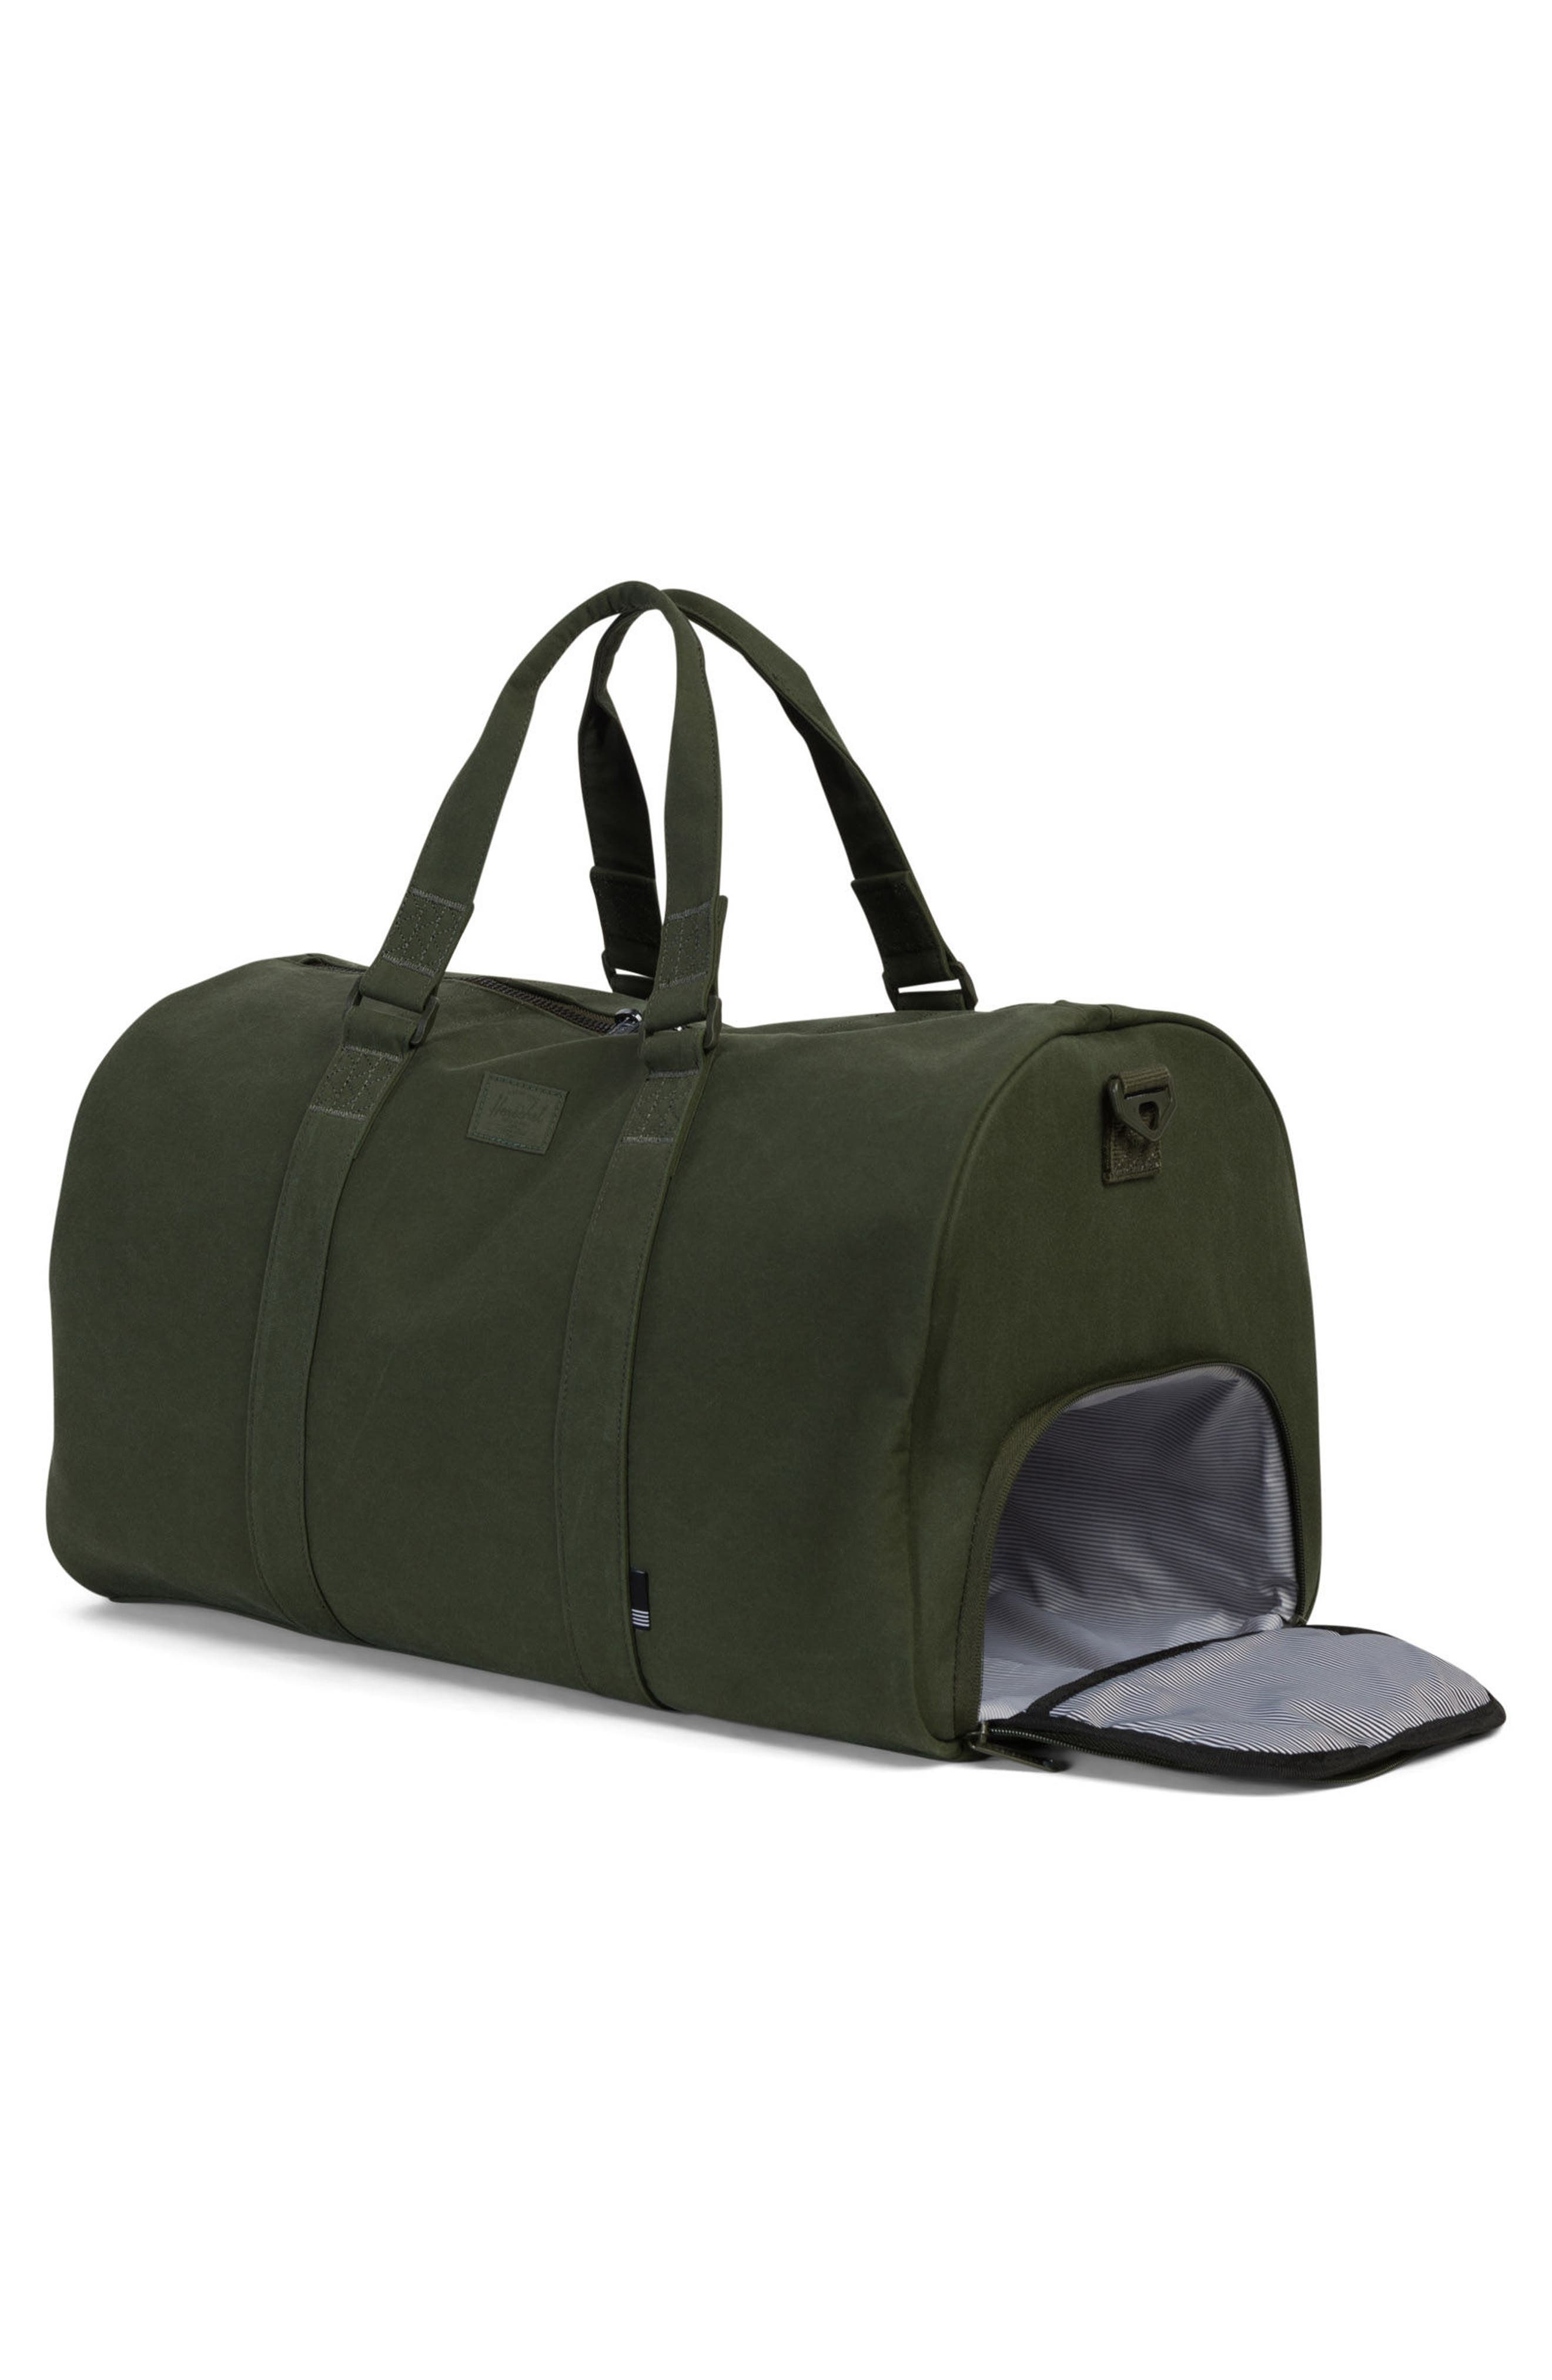 Novel Duffel Bag,                         Main,                         color, 303